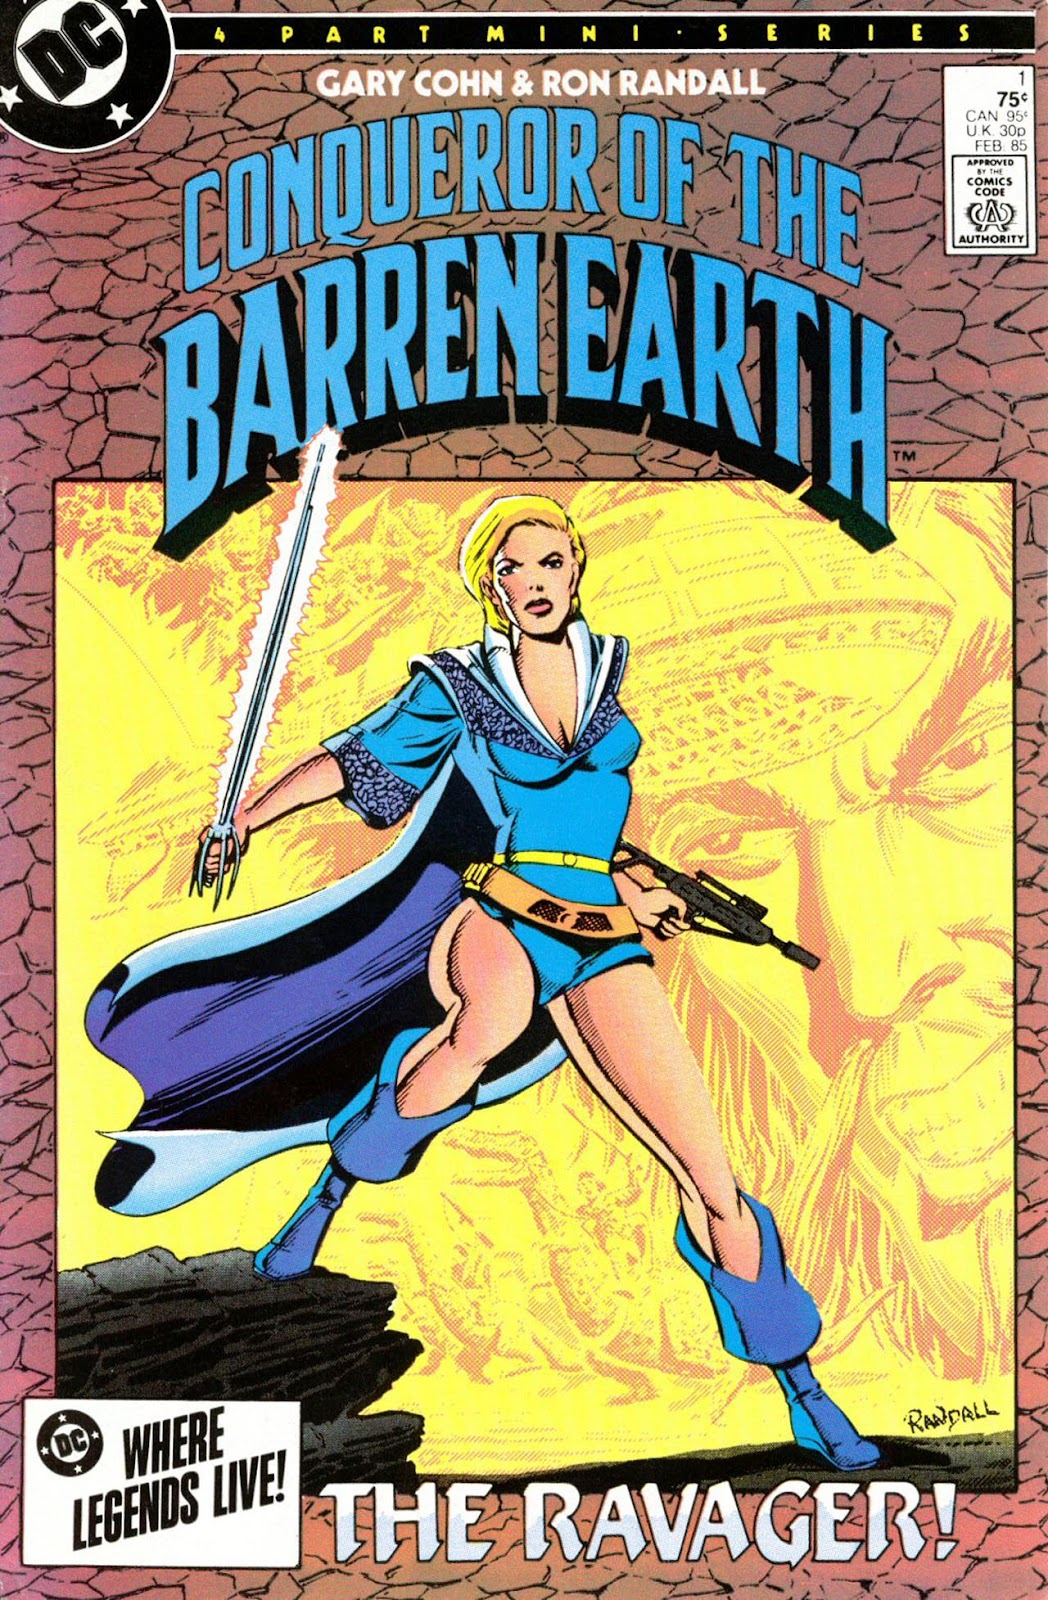 Conqueror of the Barren Earth 1 Page 1